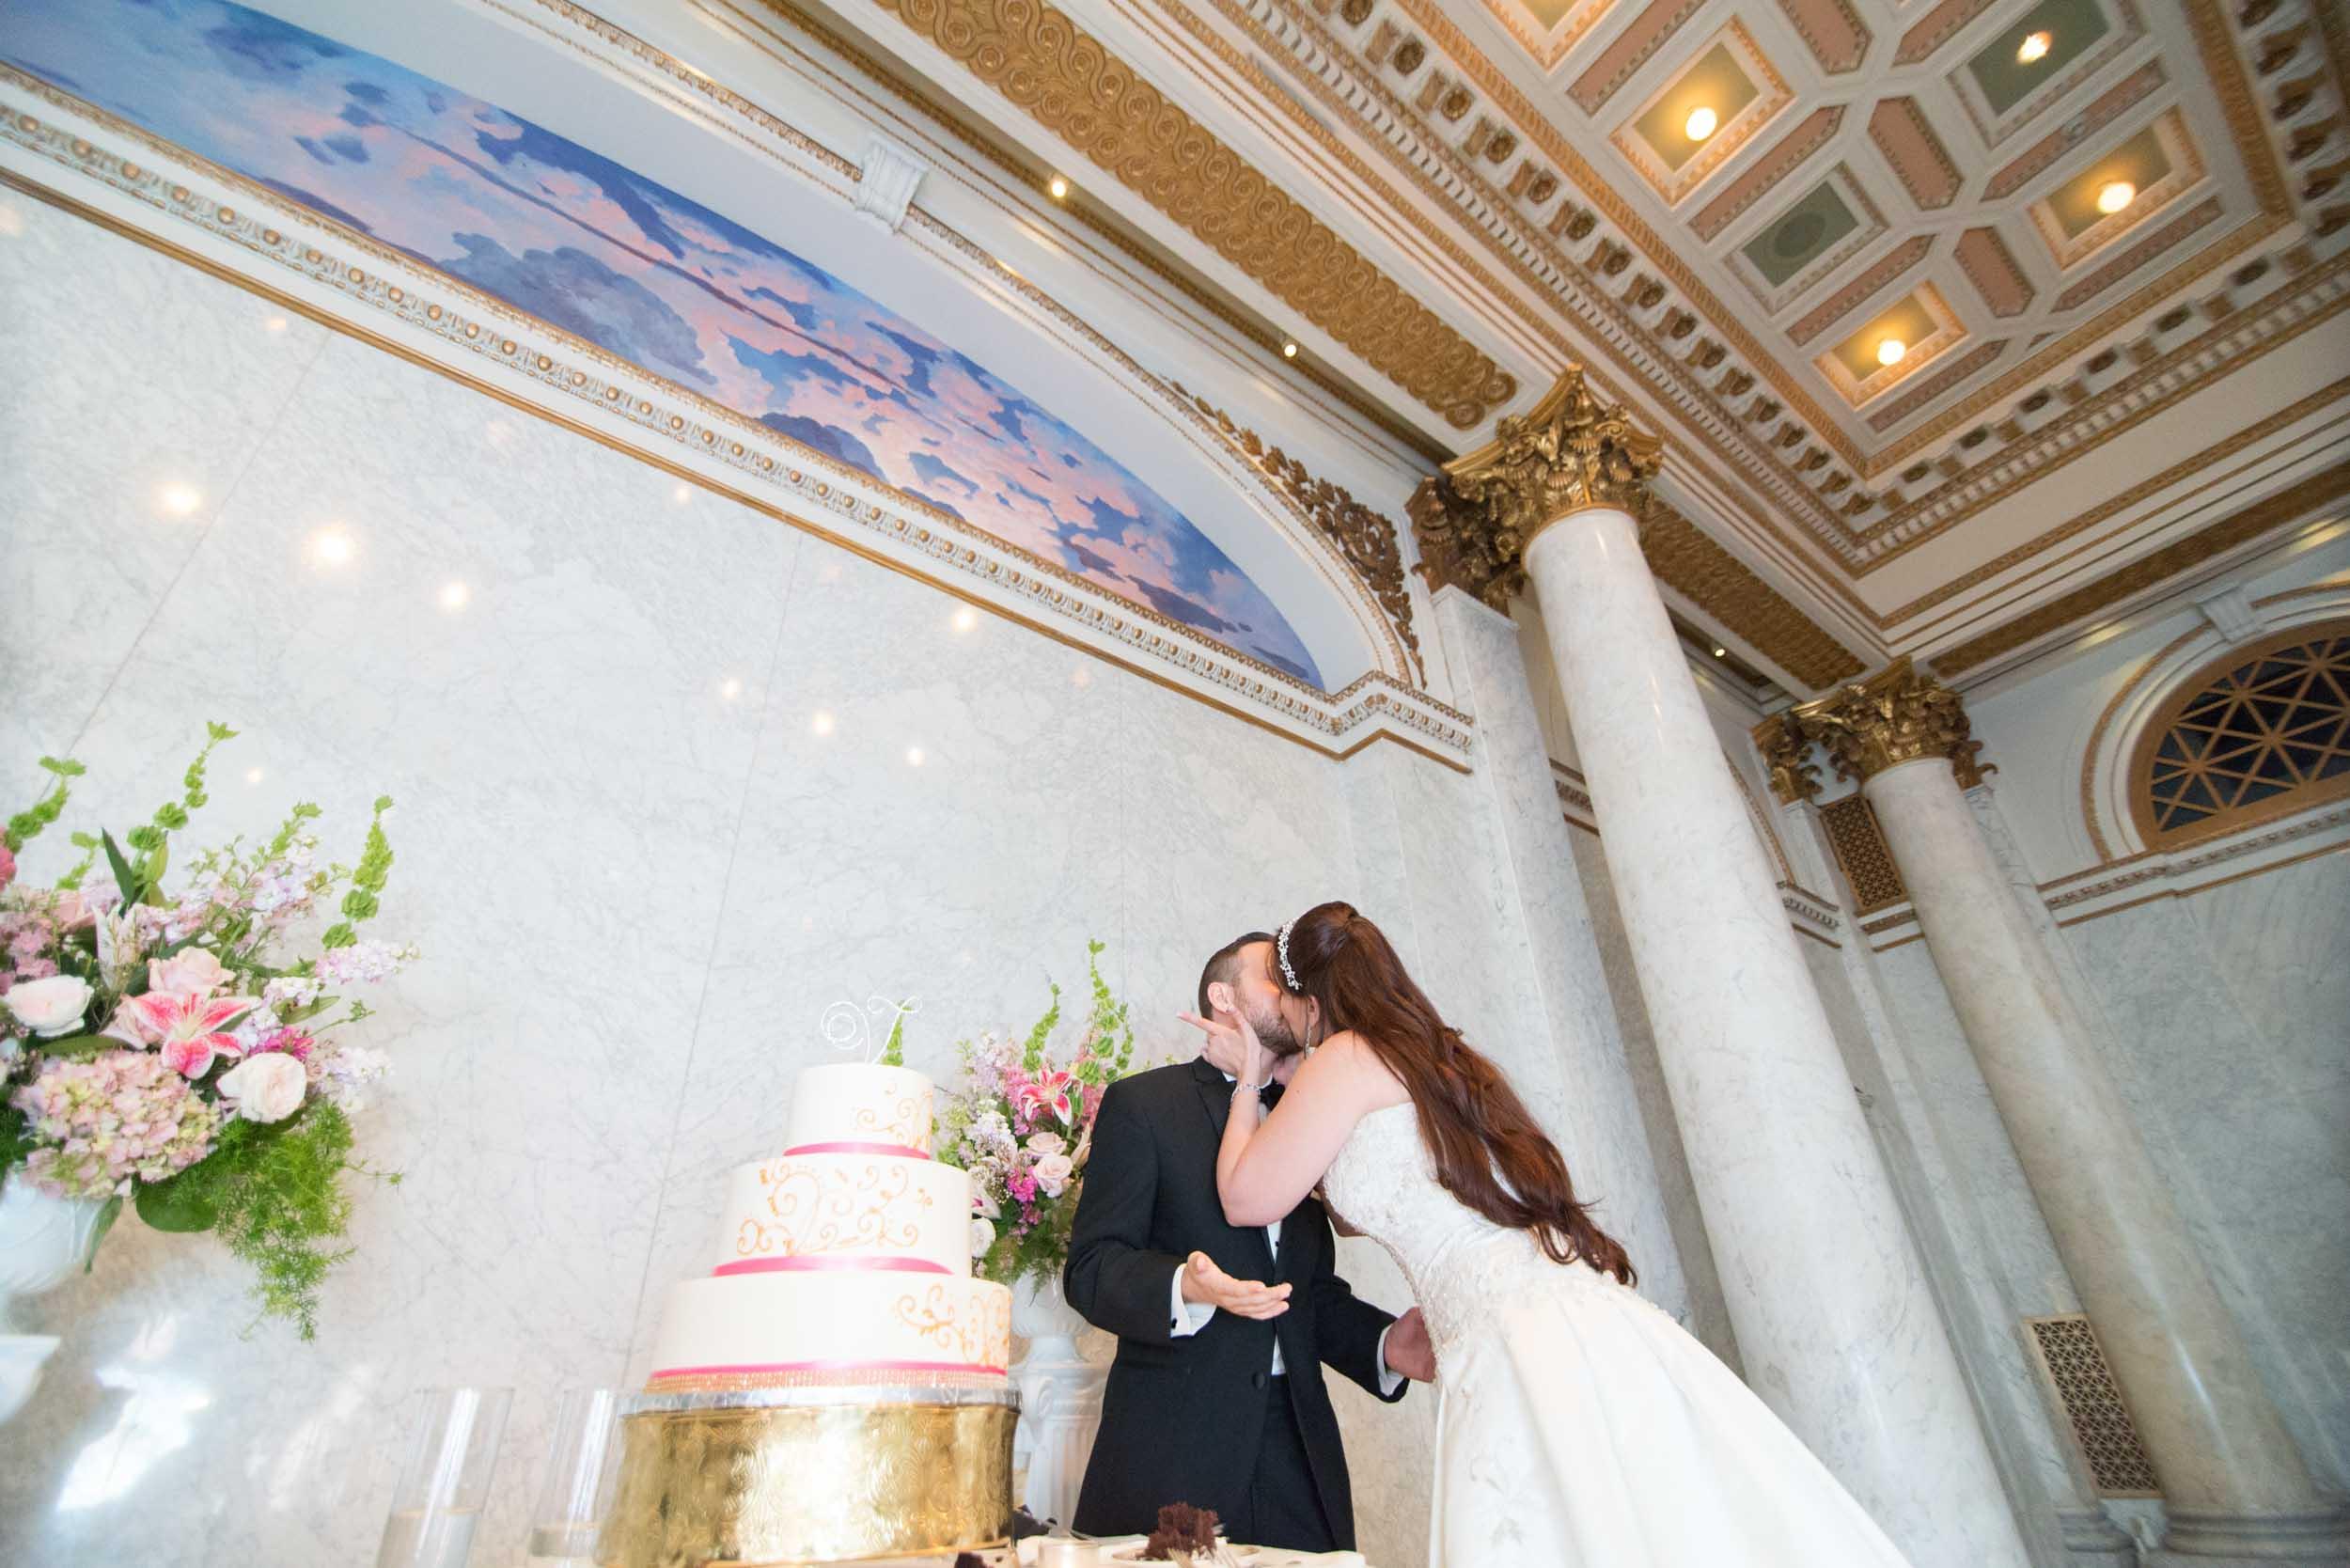 dc+metro+wedding+photographer+vadym+guliuk+photography+wedding+cake-cutting-2022.jpg